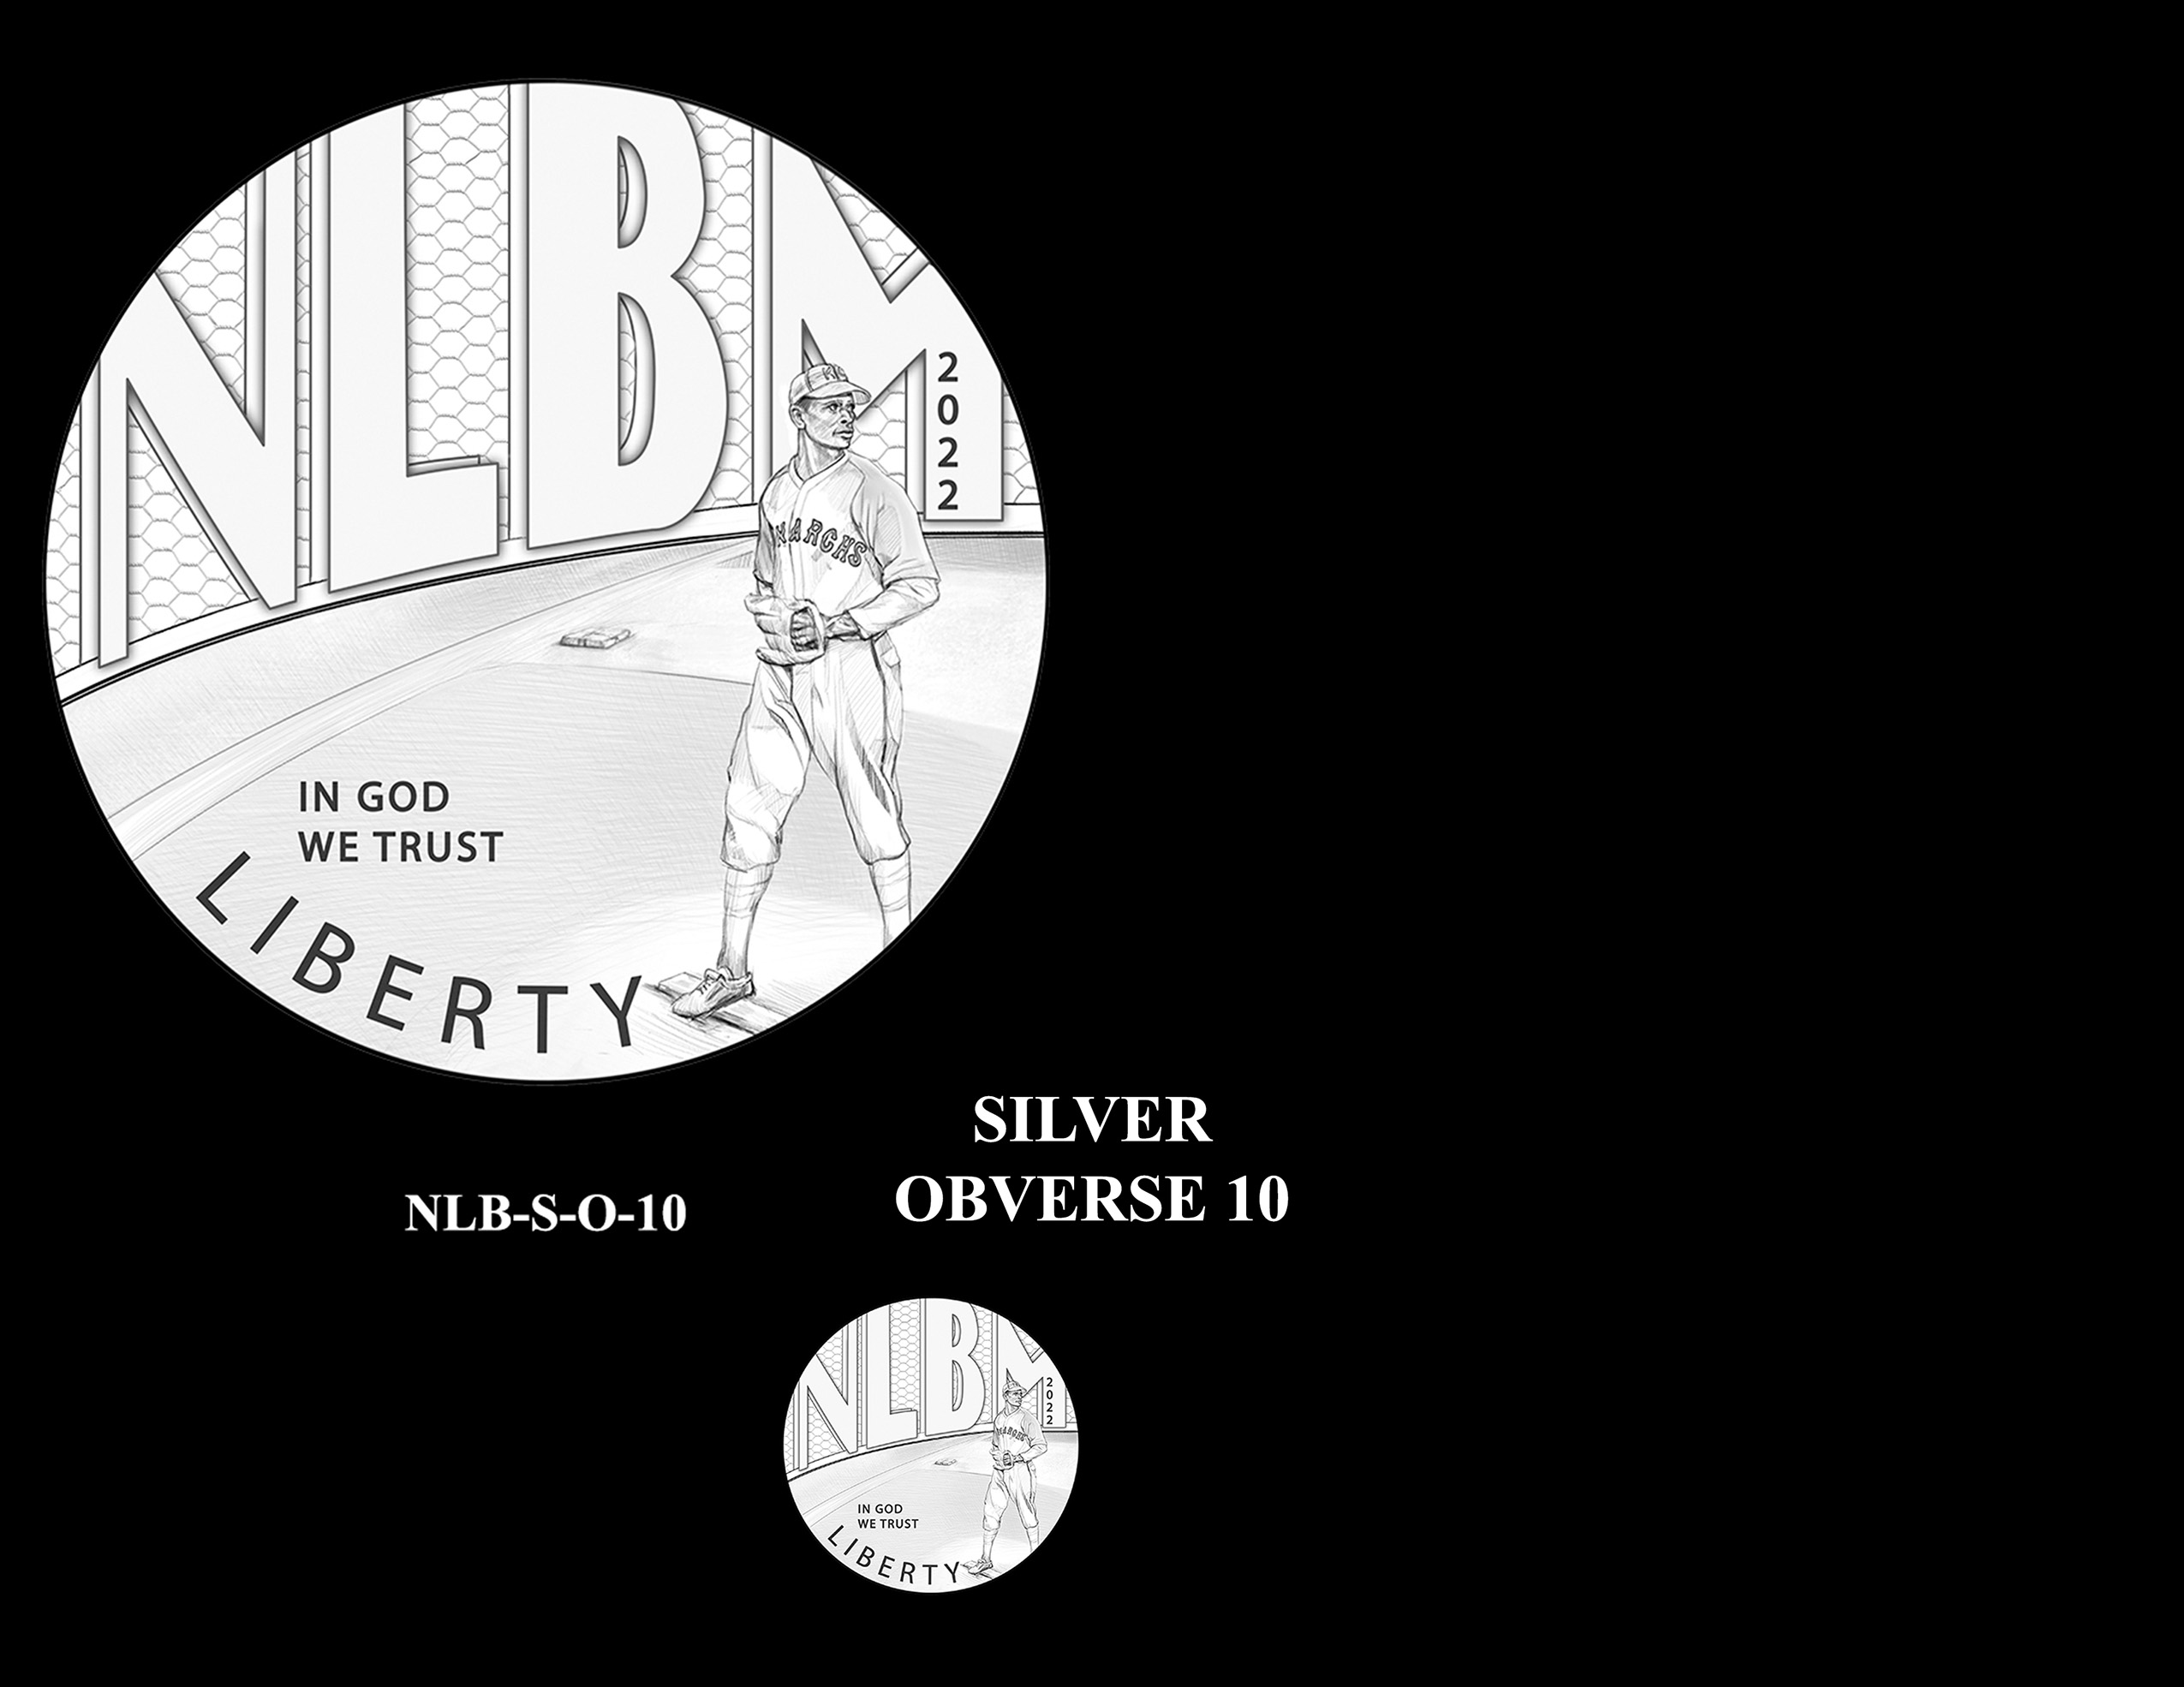 Silver Pair 10 -- Negro Leagues Baseball Commemorative Coin Program